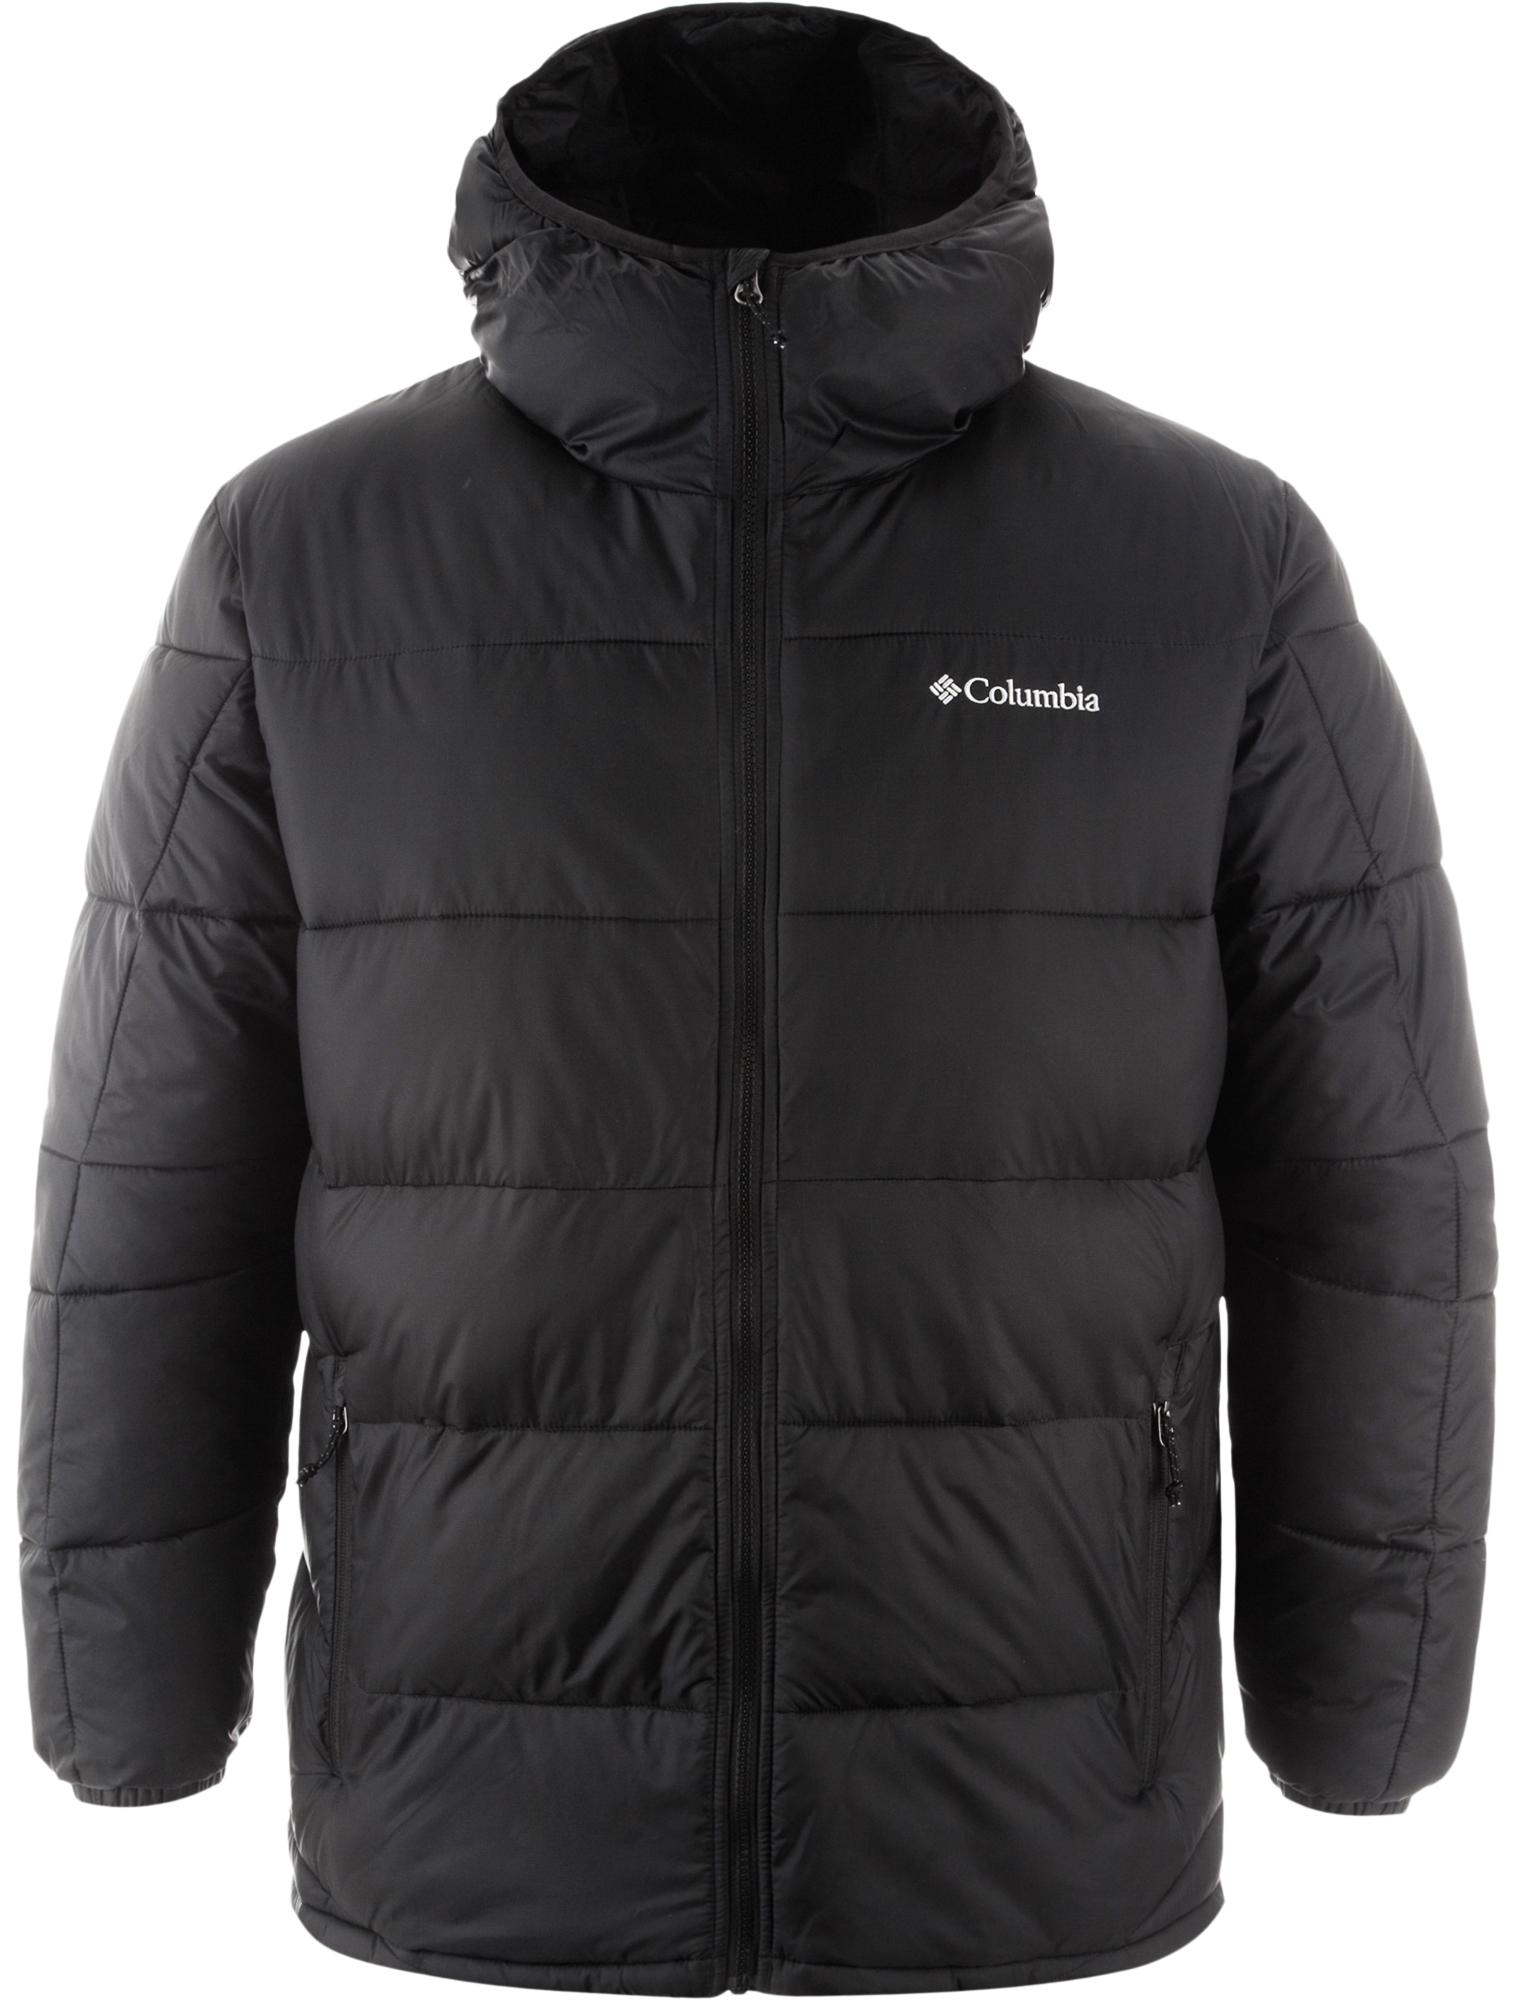 Columbia Куртка утепленная мужская Columbia Munson Point, размер 56-58